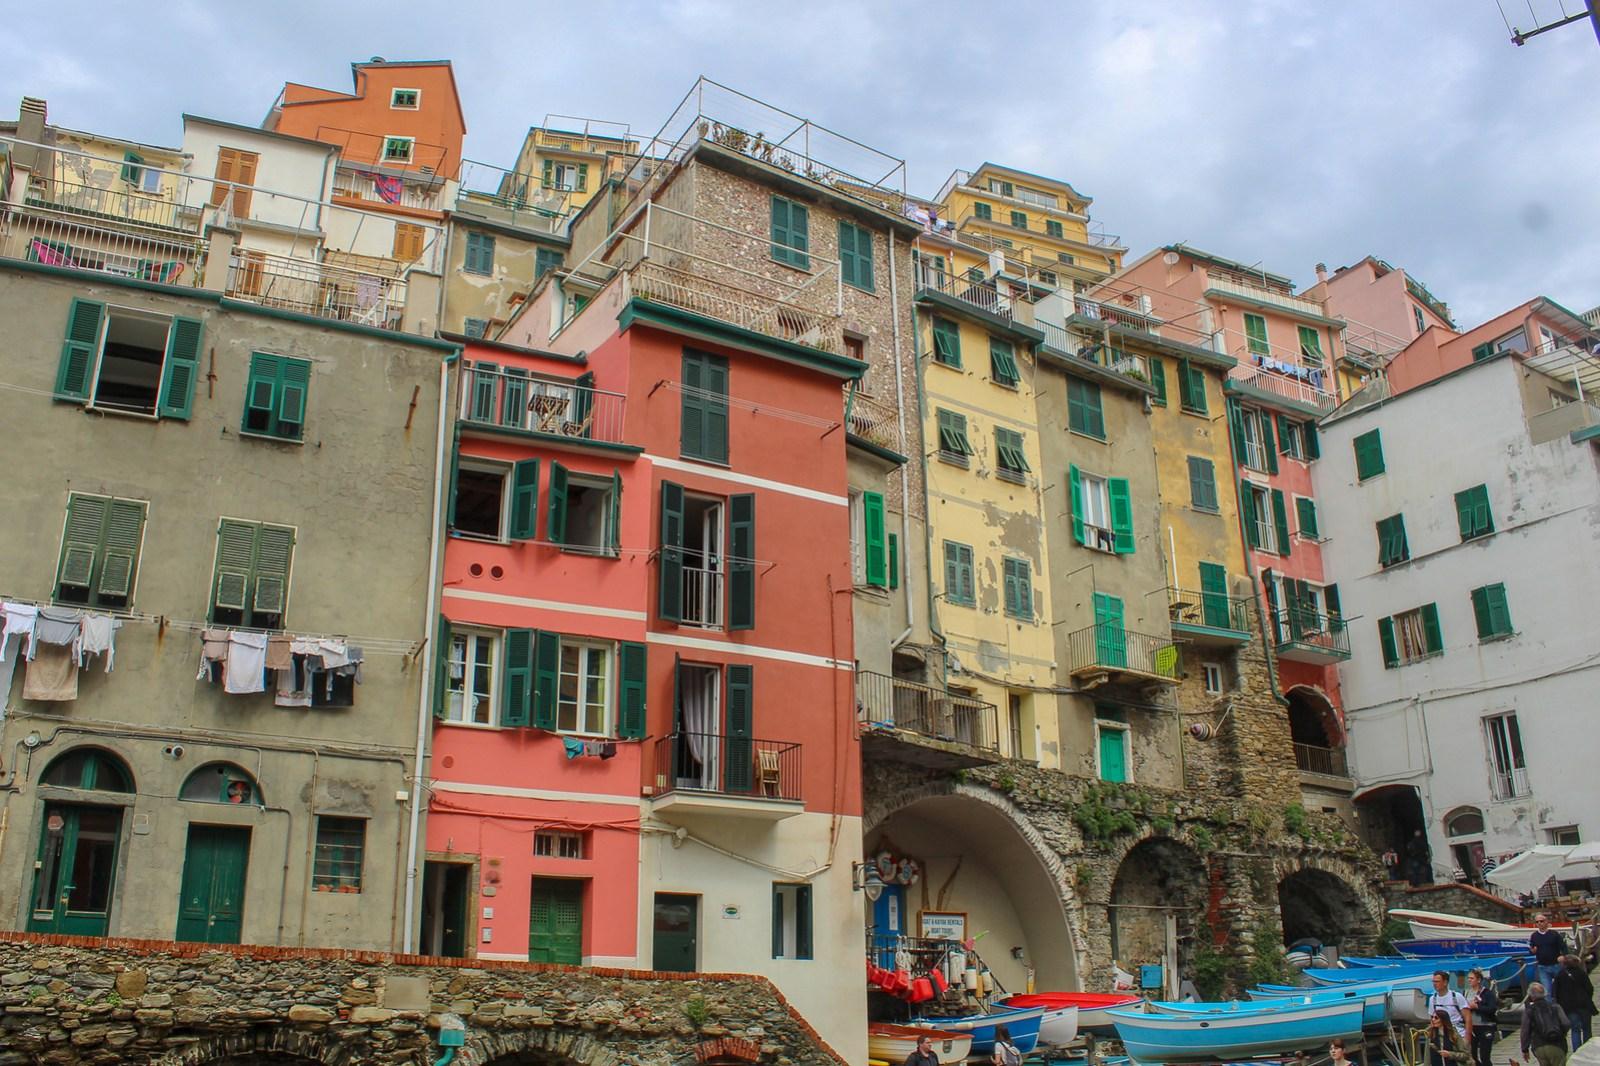 riomaggiore is a good option for where to stay in cinque terre